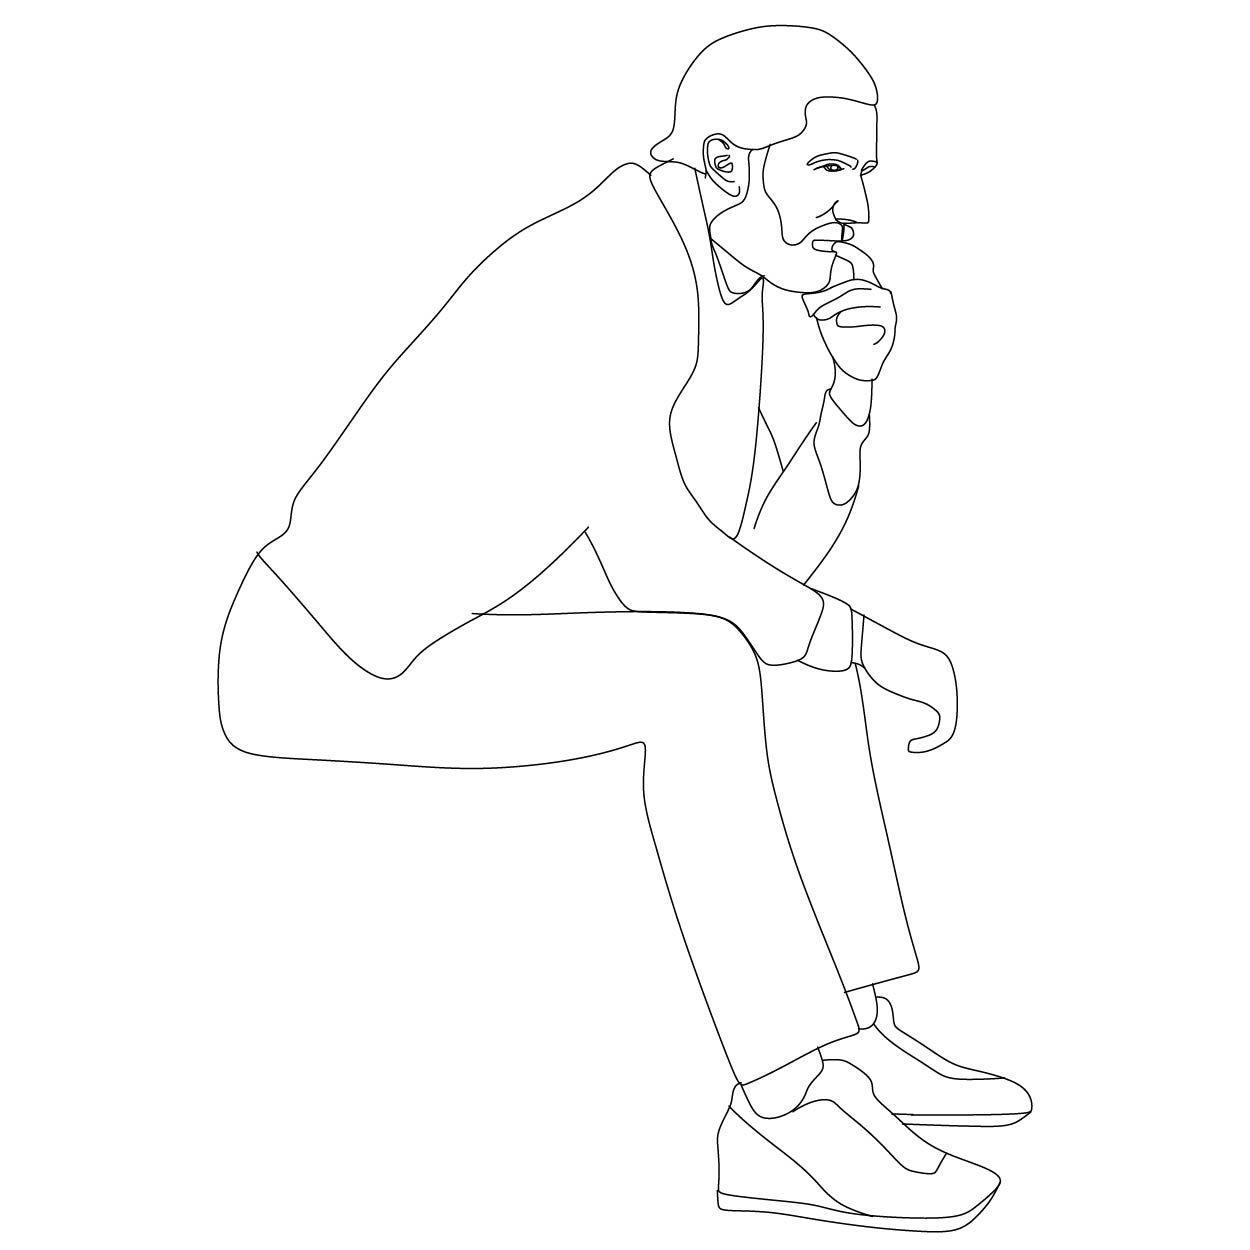 Man Sitting Drawing People Silhouette People People Sitting Png